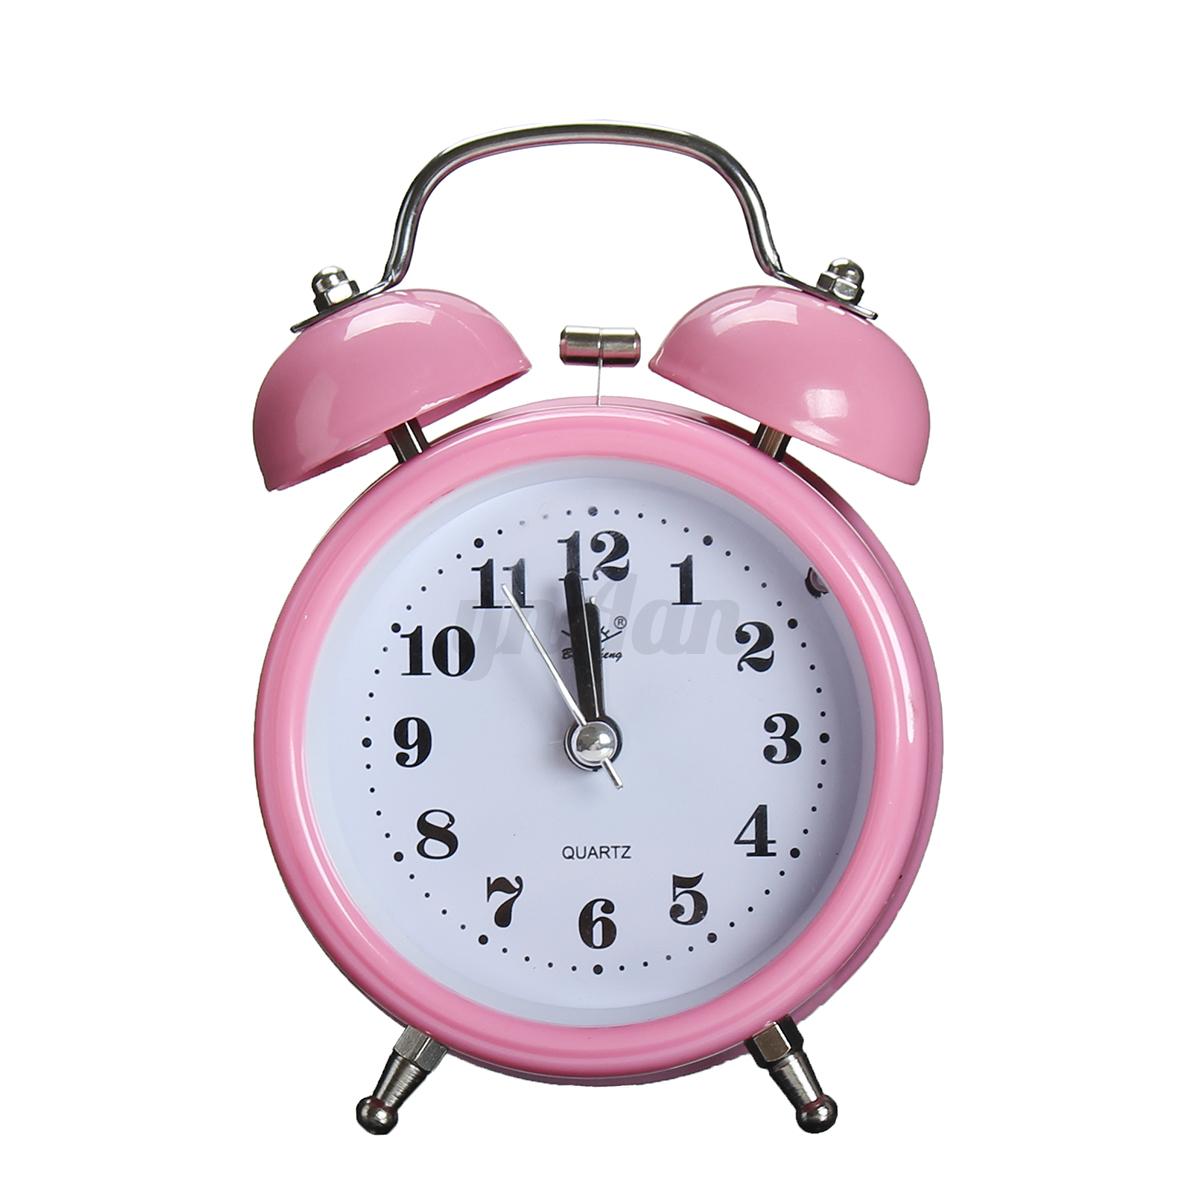 Images of Cute Alarm Clocks Unicorn - #rock-cafe